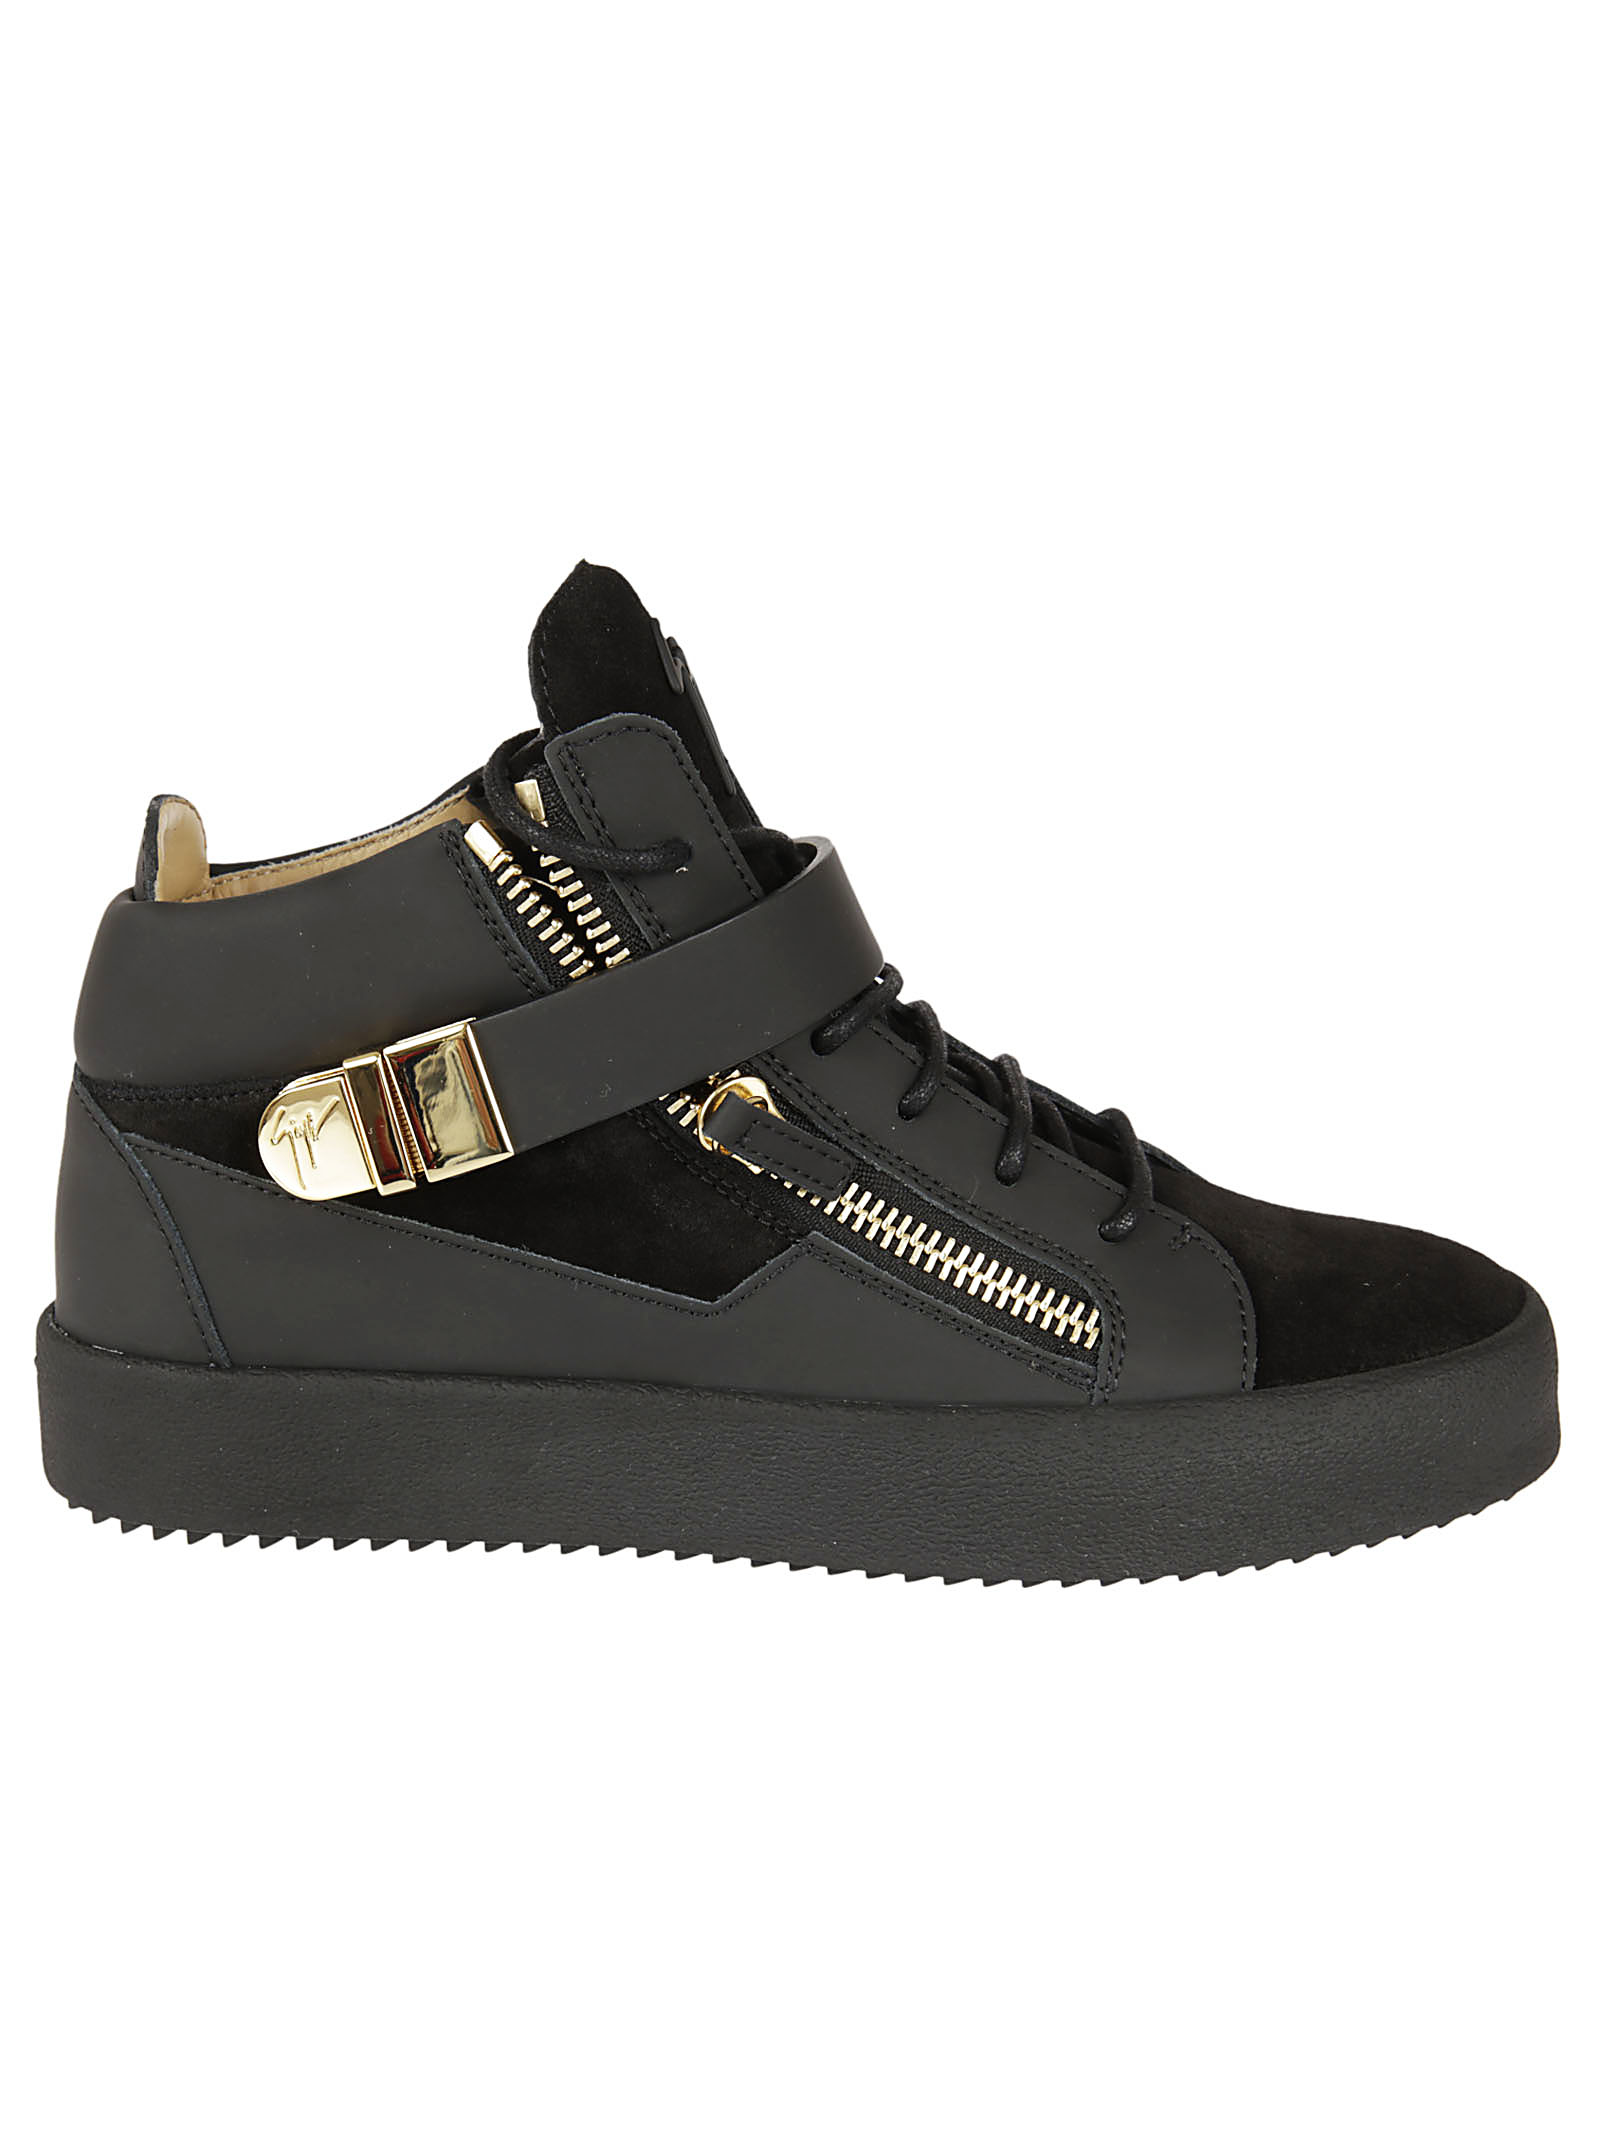 Giuseppe Zanotti Giuseppe Zanotti Carter Mid-Top Sneakers